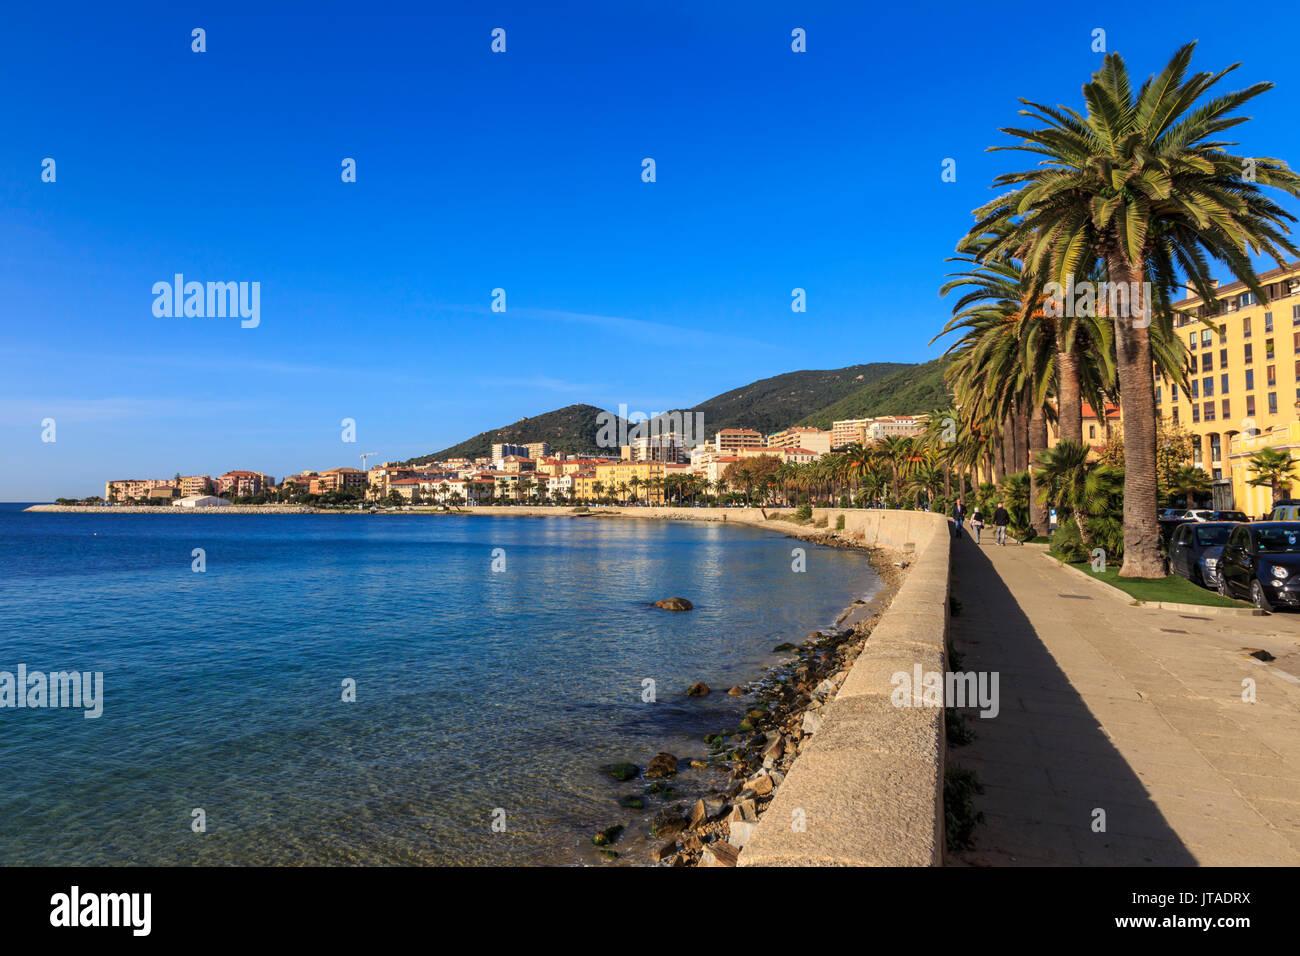 Saint Francois beach promenade with palm trees, morning light, Ajaccio, Island of Corsica, Mediterranean, France, Mediterranean - Stock Image